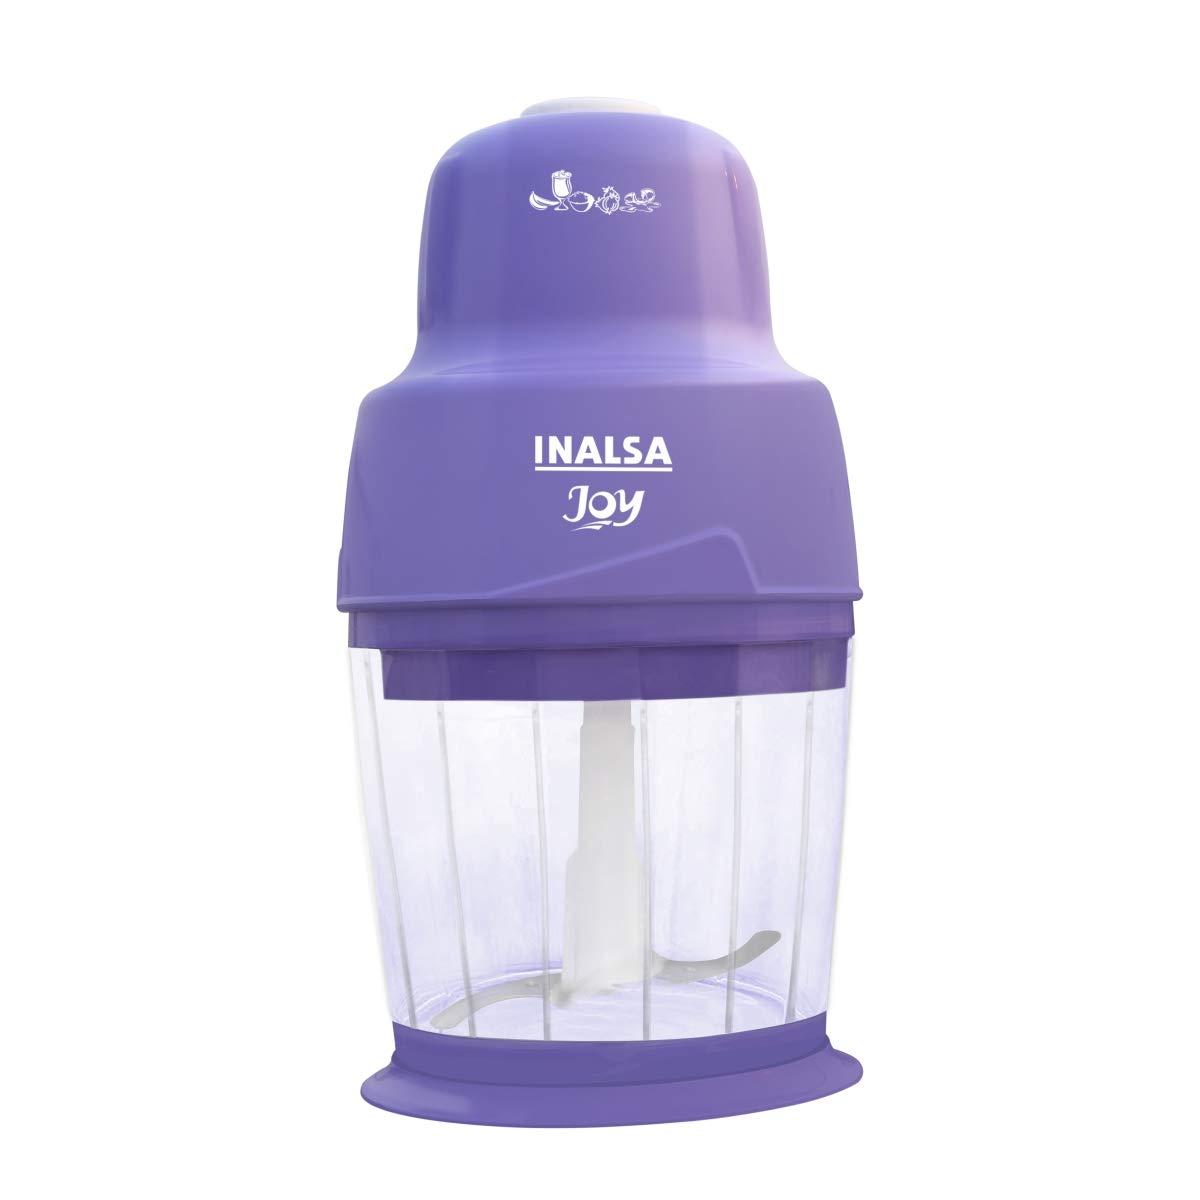 Inalsa Joy 250-Watt Mini Chopper (White And Purple)